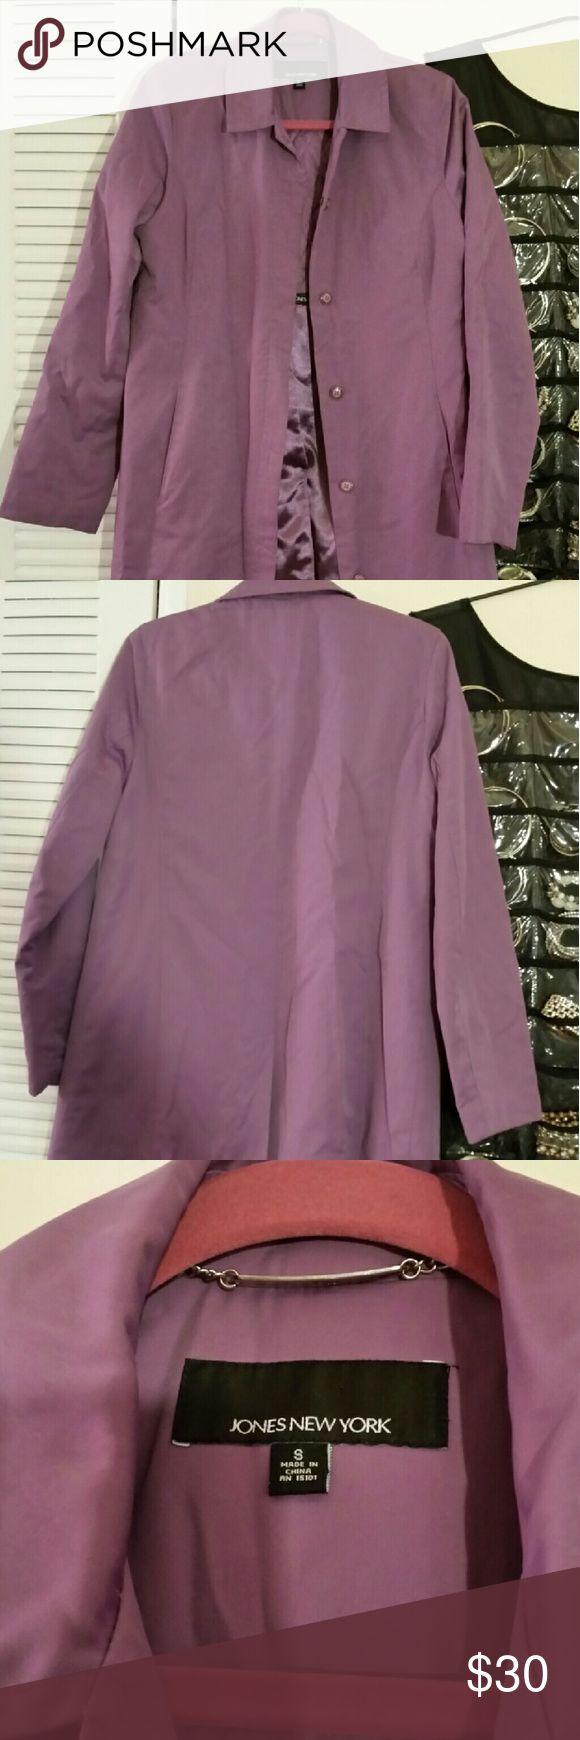 Women's rain coat Purple rain coat New York & Company Jackets & Coats